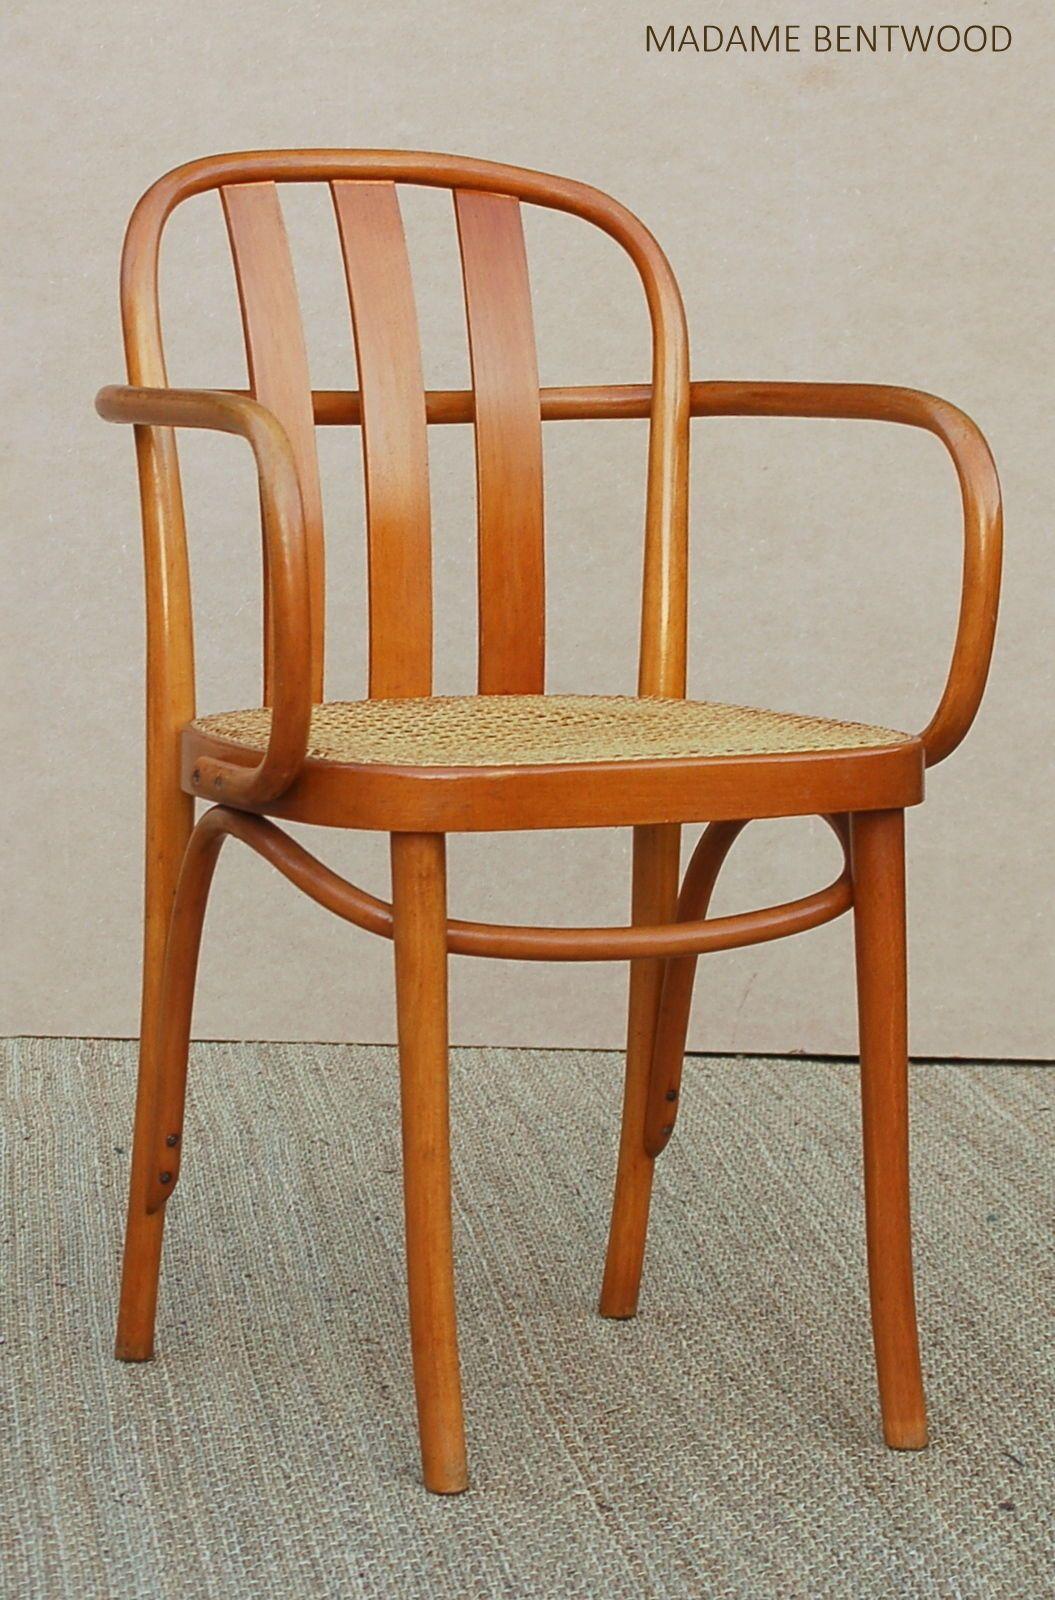 Chaise Fauteuil Bistrot Prague Chair Type 811 Design Hoffmann Thonet Ebay Chair Chair Types Chaise